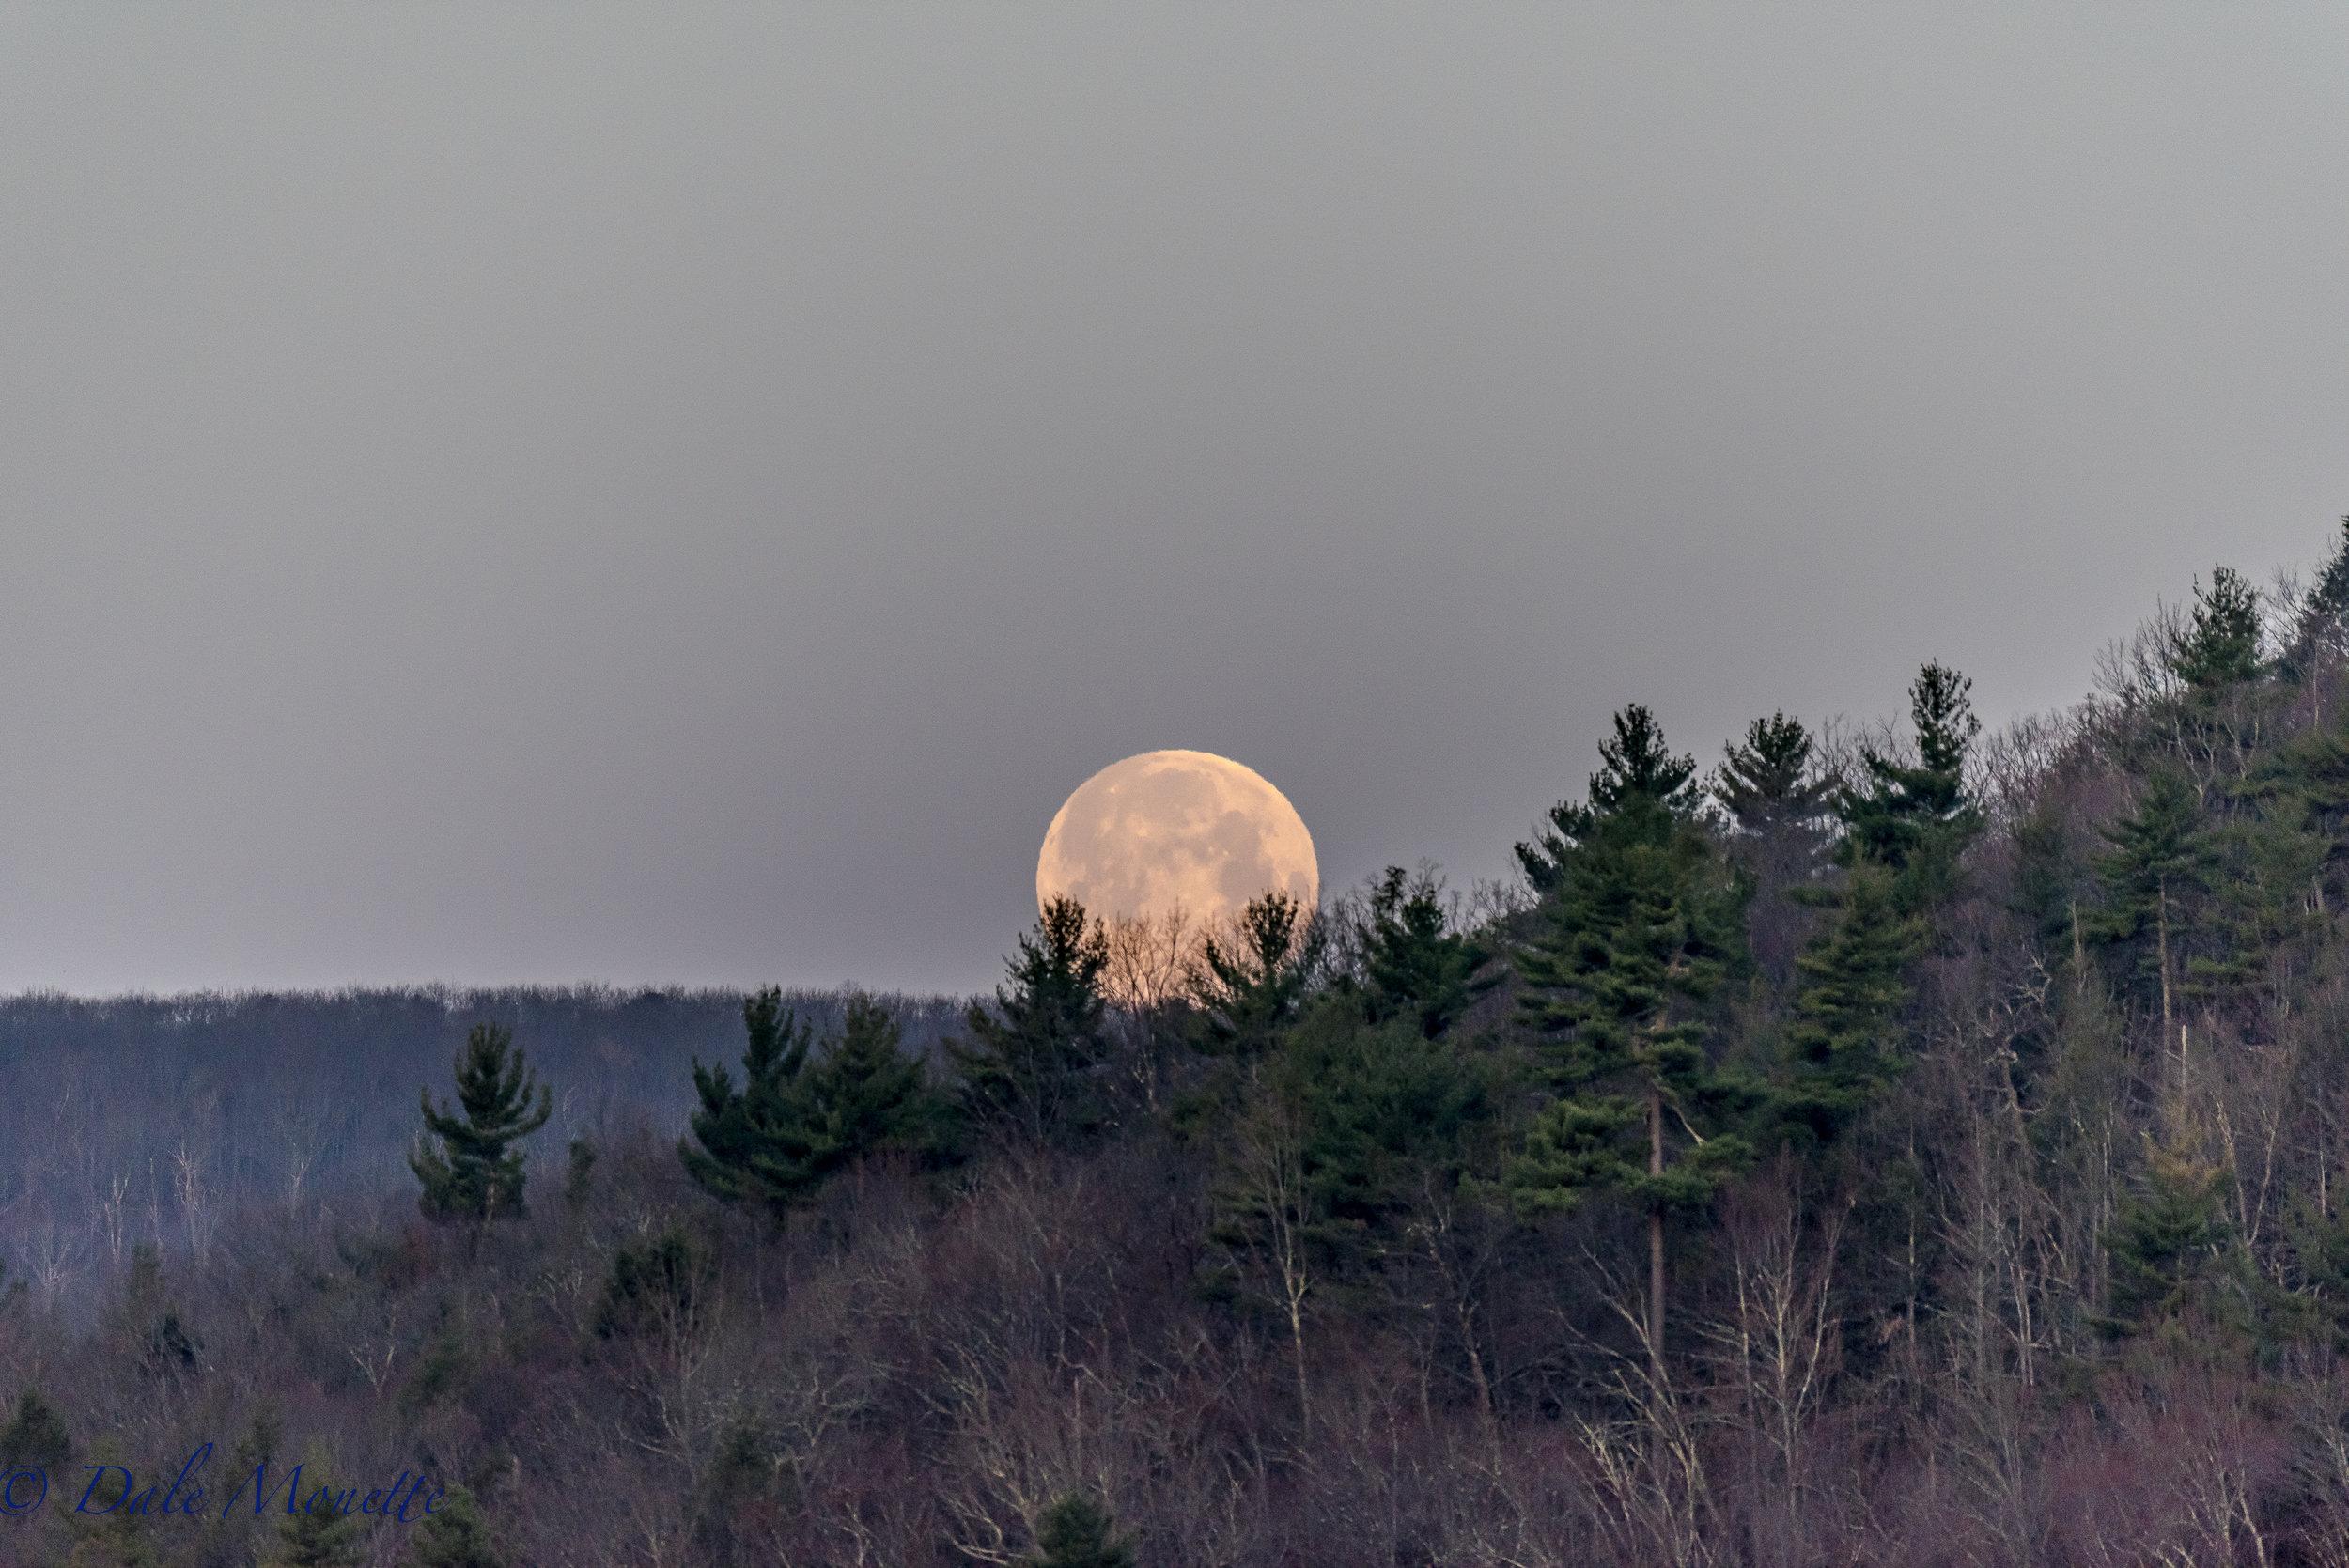 Quabbin Valley moon over New Salem. 4/11/17